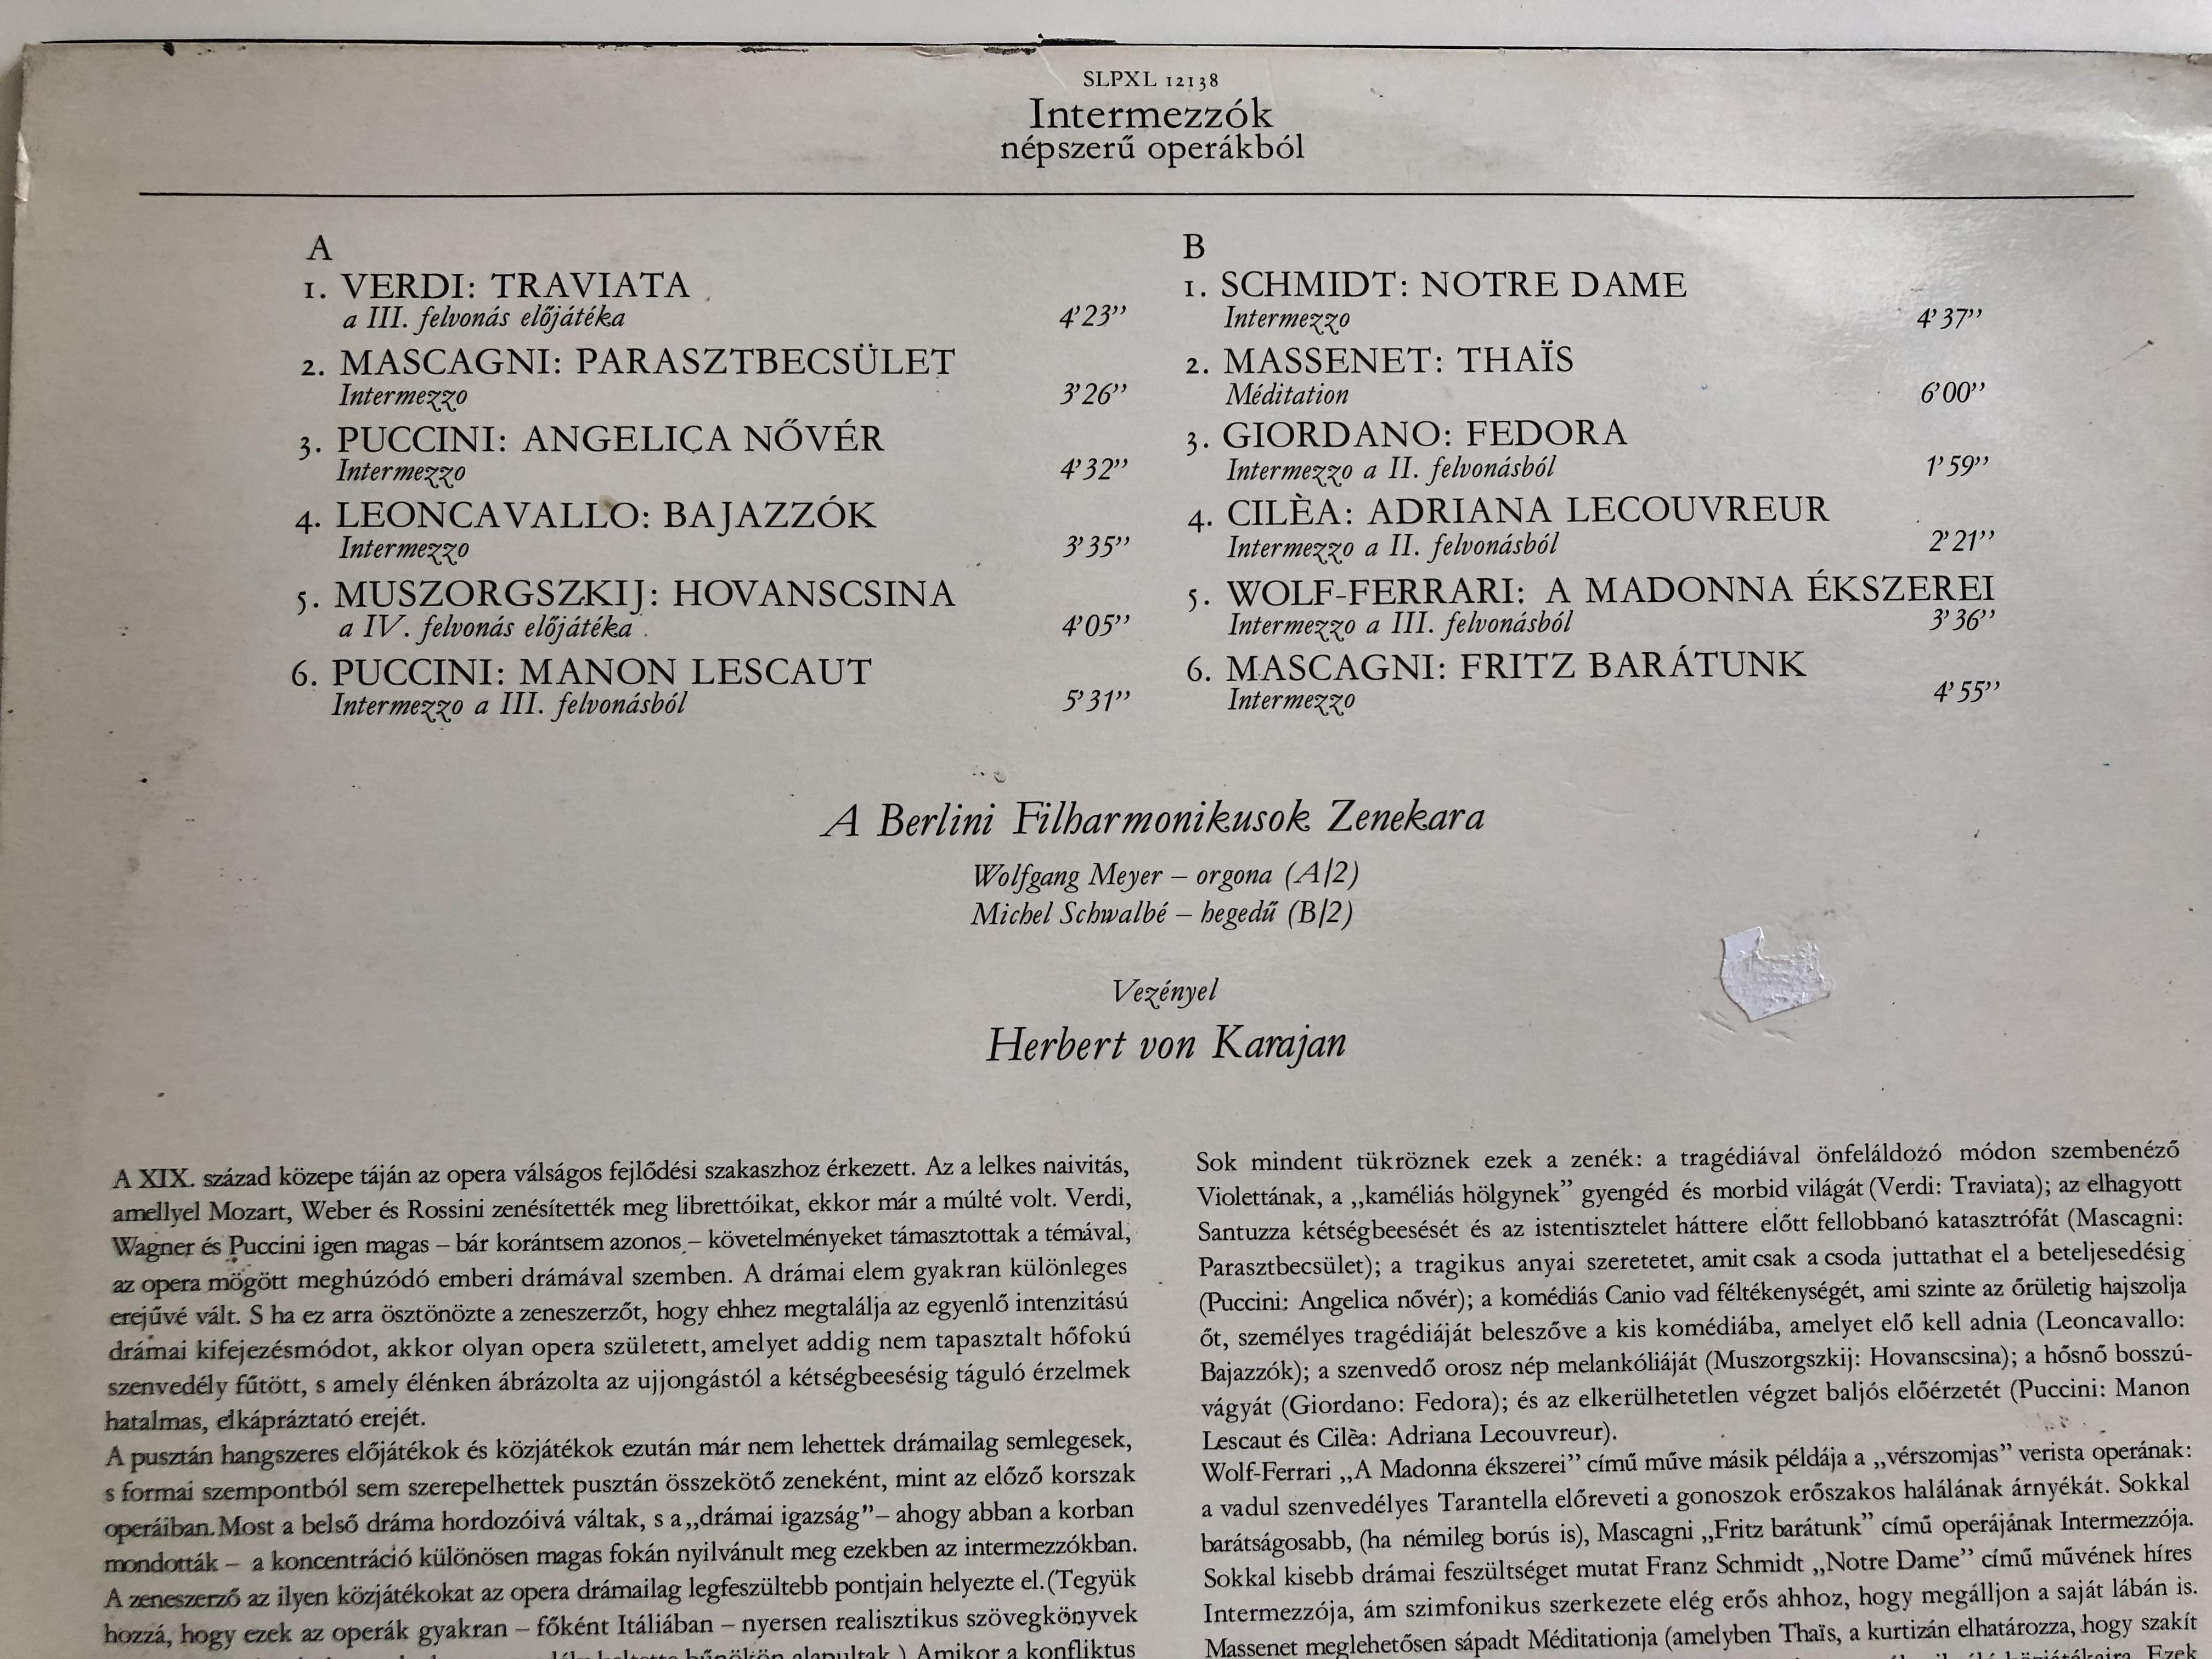 intermezzo-k-zj-t-kok-n-pszer-oper-kb-l-a-berlini-filharmonikusok-zenekara-herbert-von-karajan-hungaroton-lp-stereo-slpxl-12138-4-.jpg